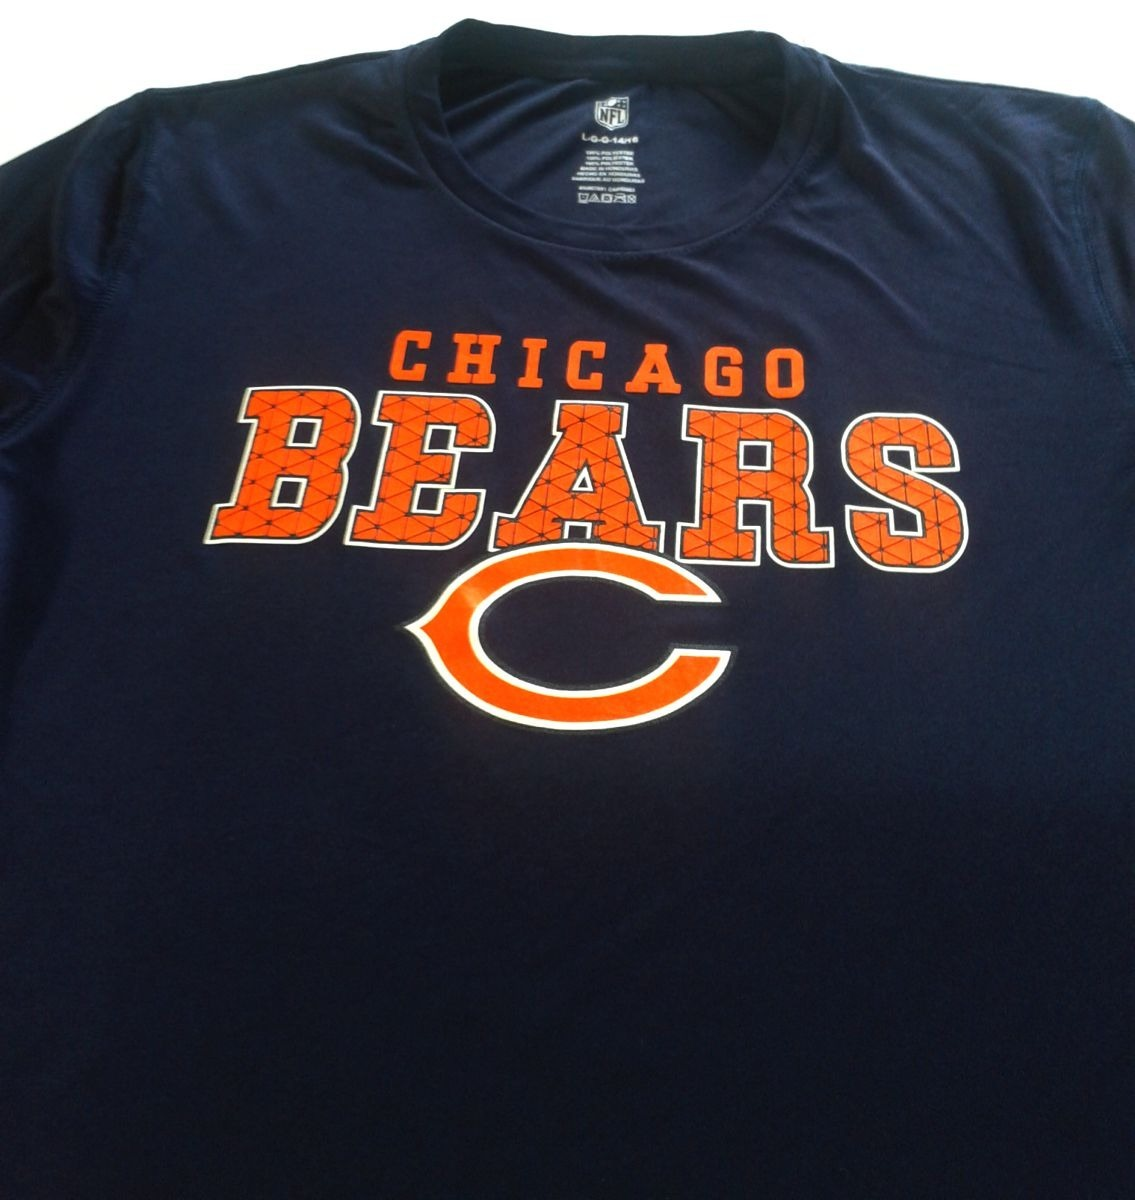 ecd32f60904dc Remera Deportiva Nfl Chicago Bears Original Talle 12 13 Años -   699 ...